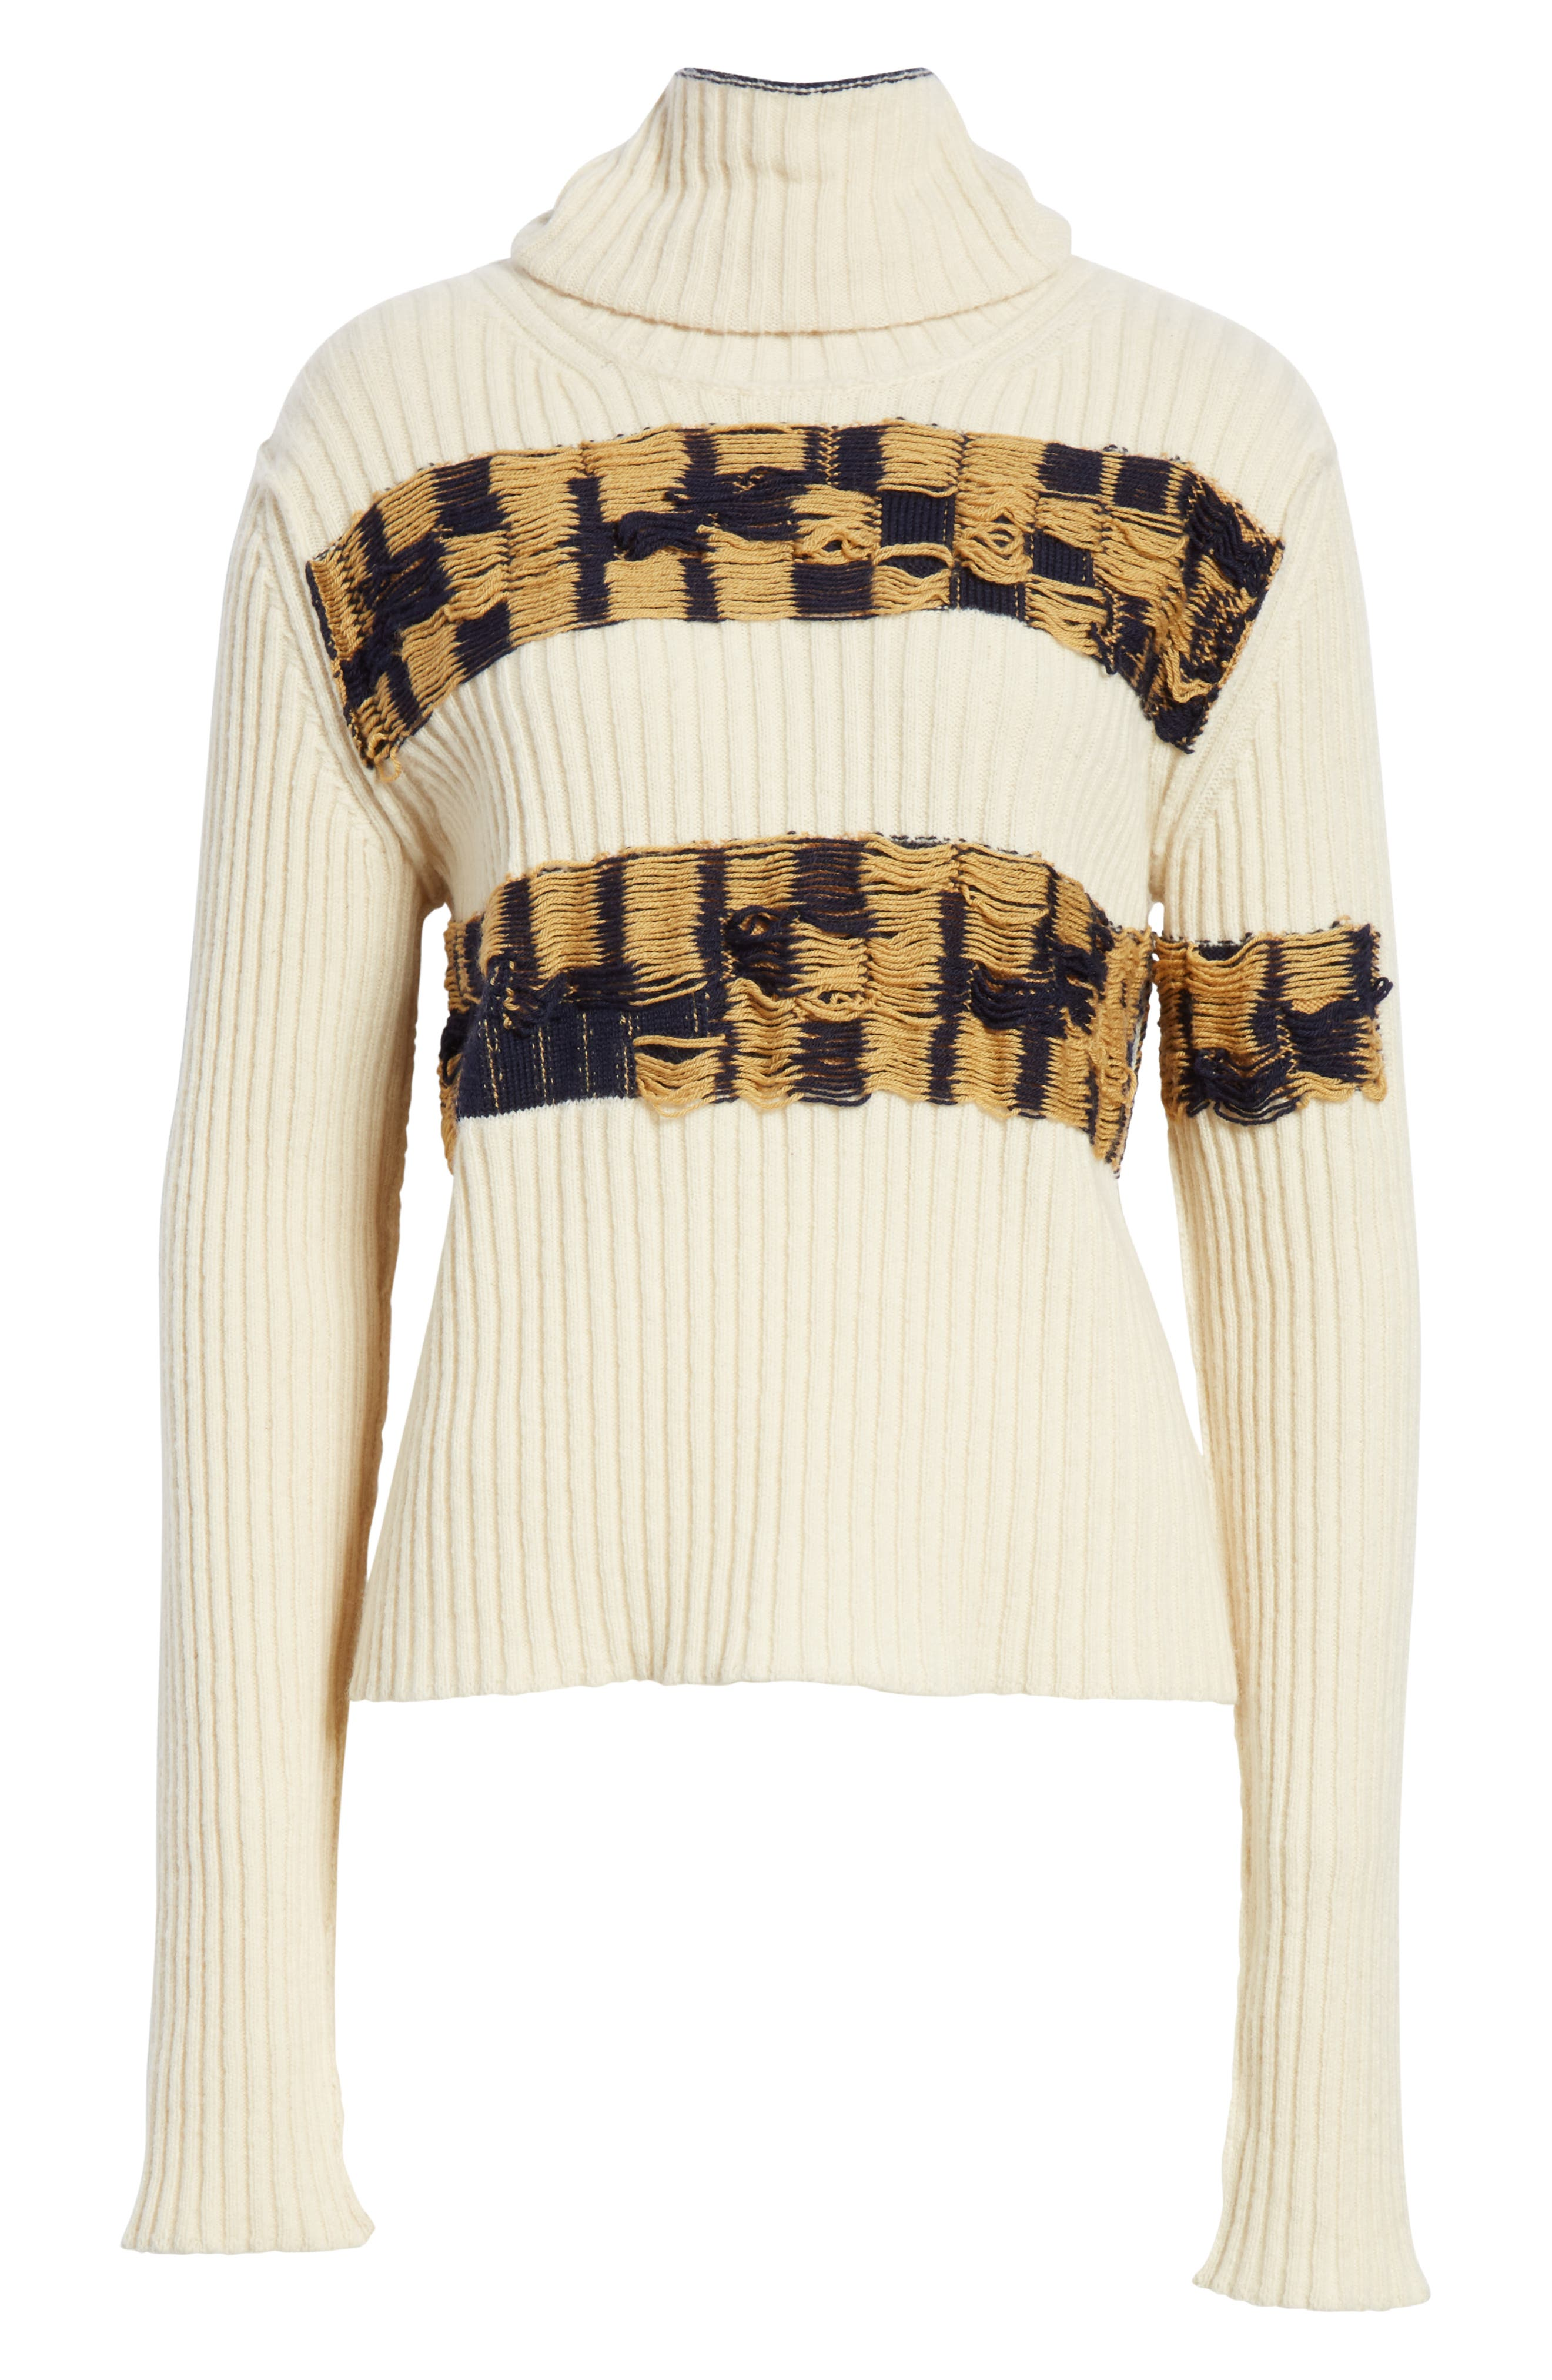 Quilt Jacquard Stripe Sweater,                             Alternate thumbnail 7, color,                             ECRU HAY NAVY